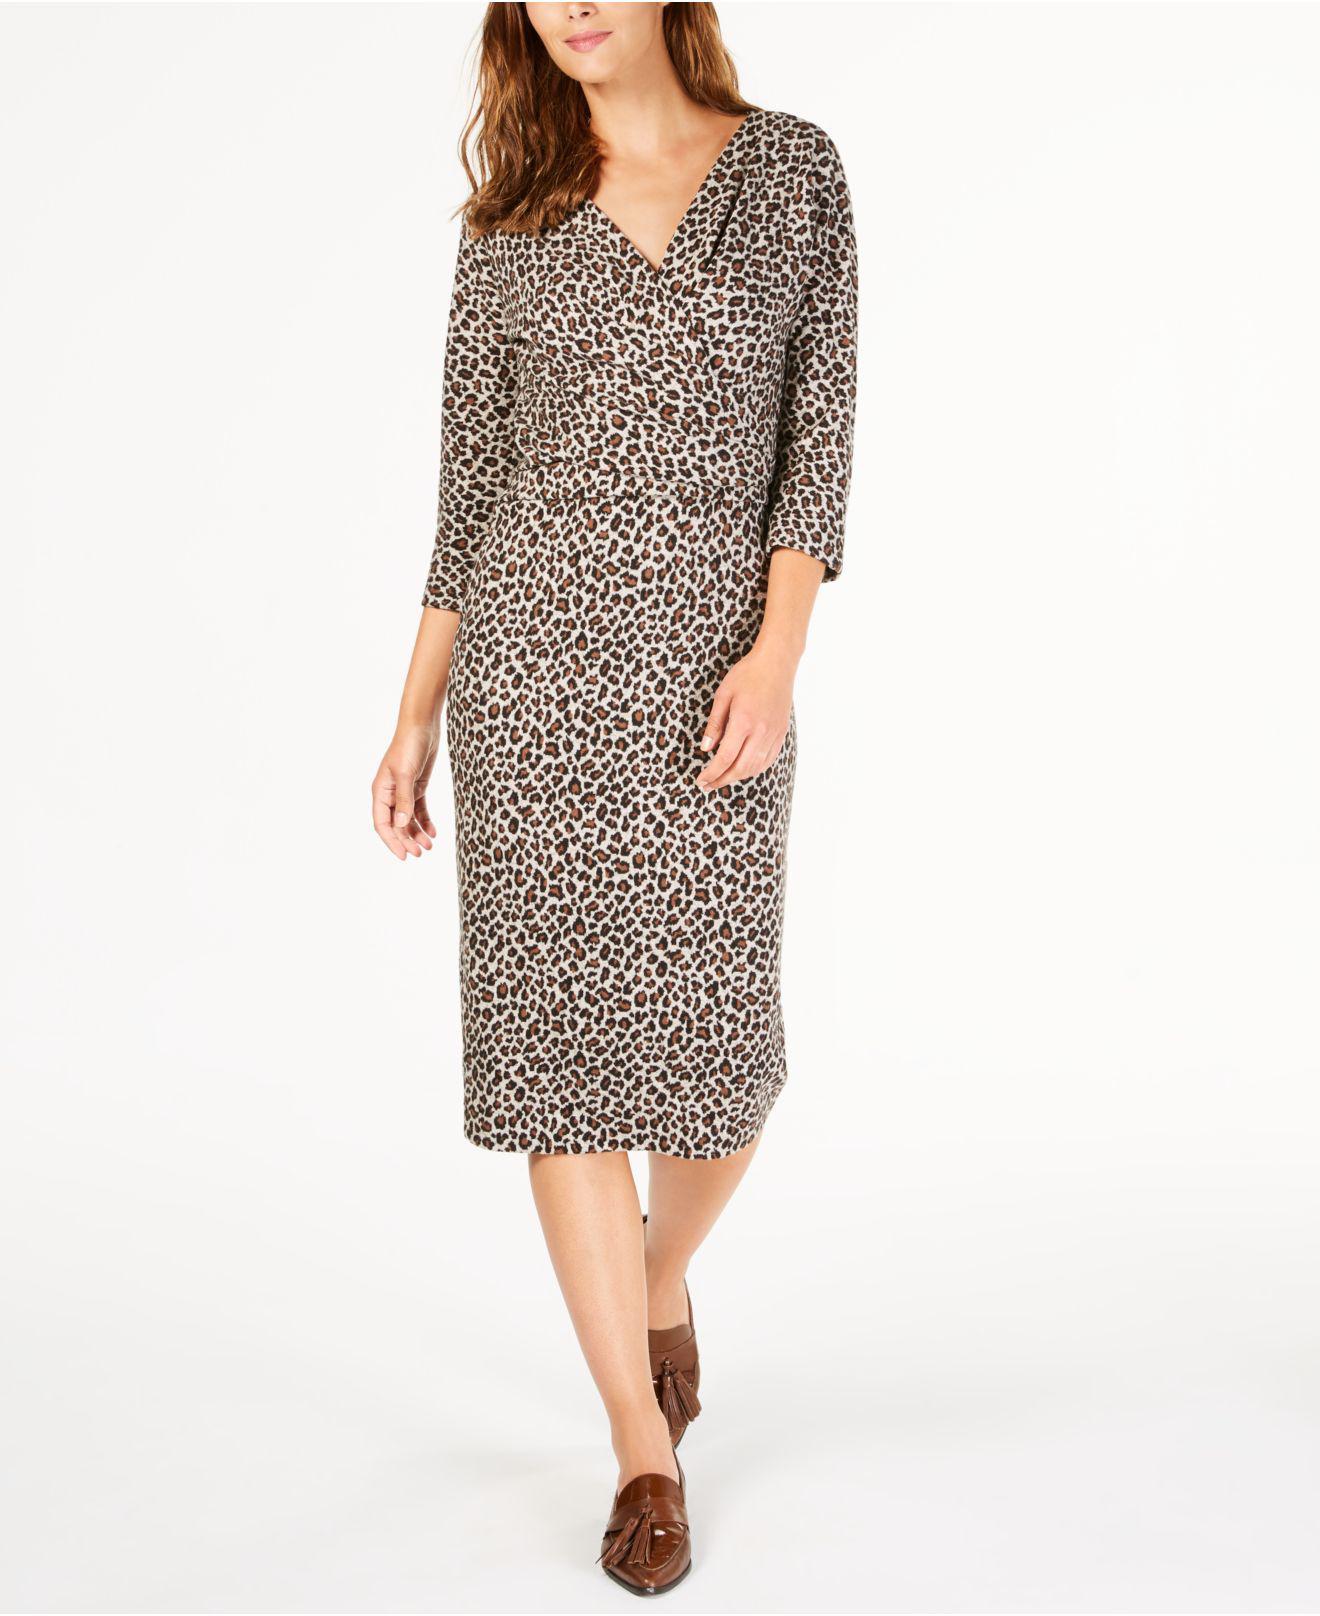 150c81a729d7d Lyst - Weekend by Maxmara Saggio Animal-print Dress in Brown